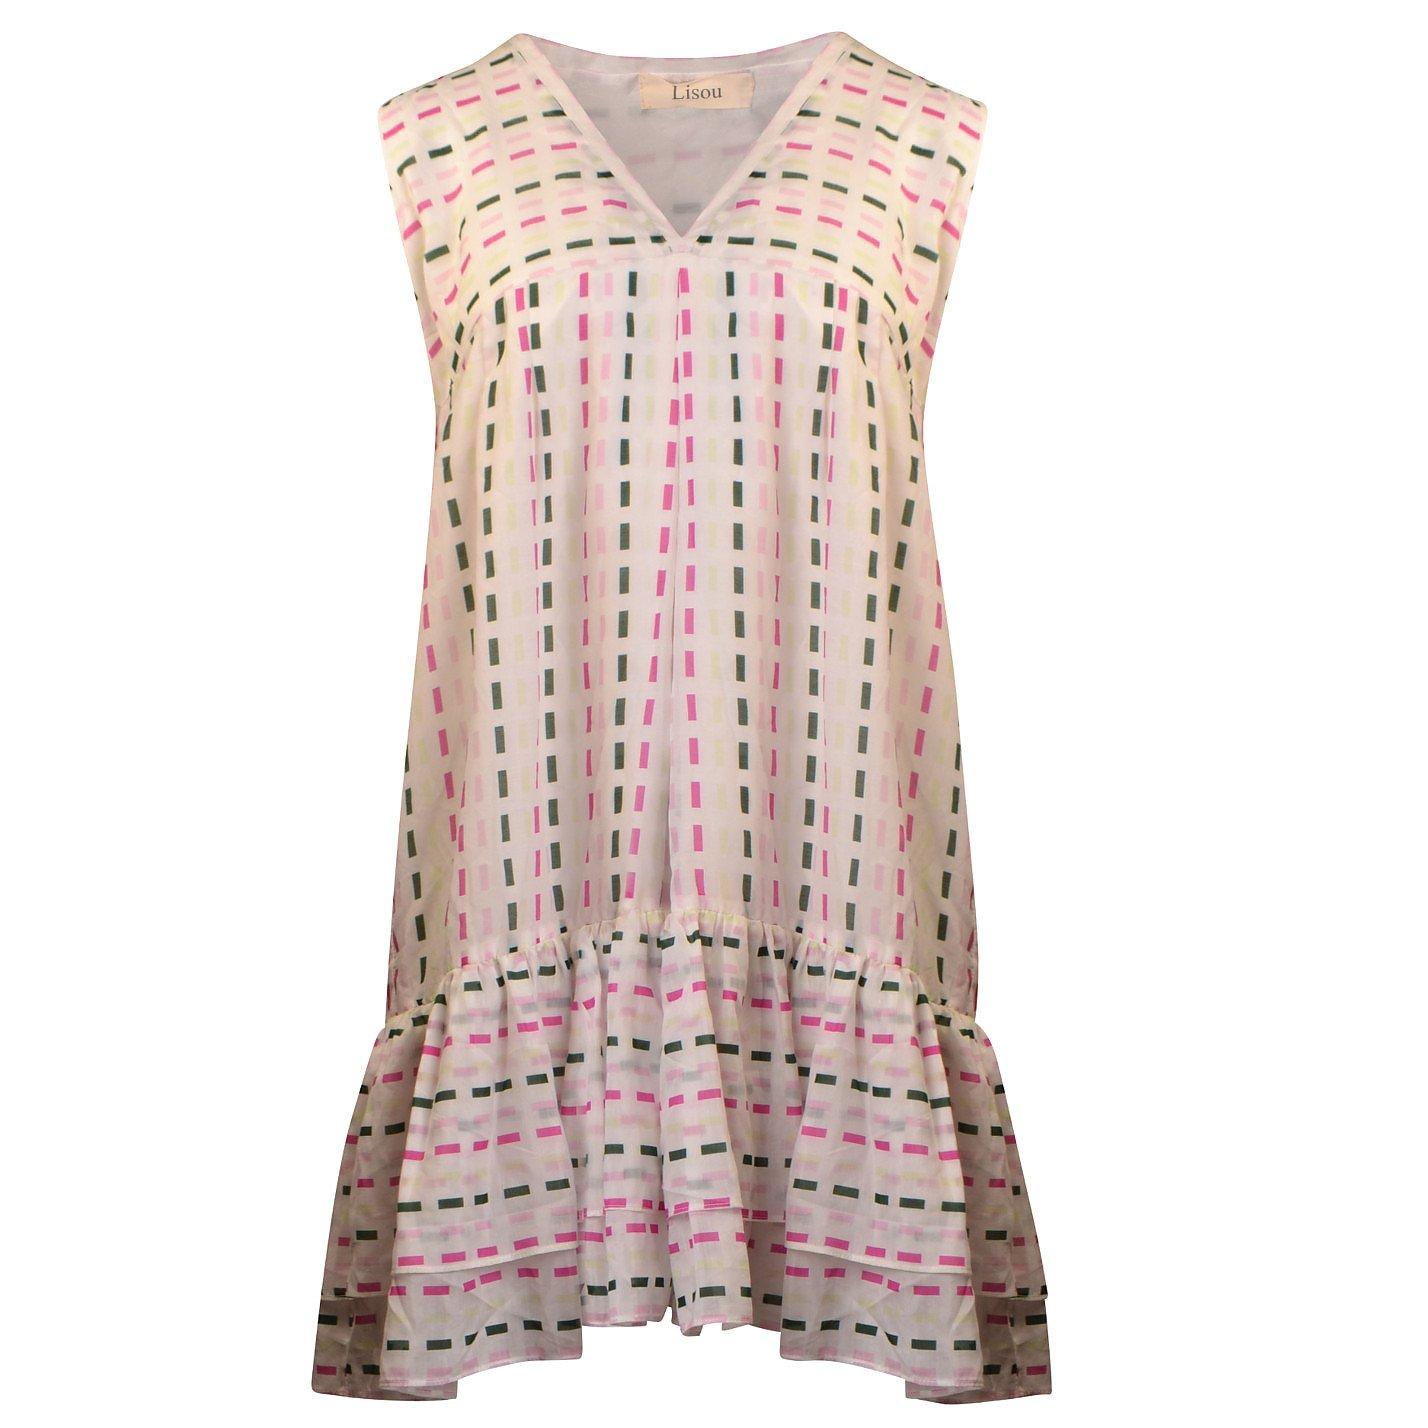 Lisou Jada Pastel Dash Dress